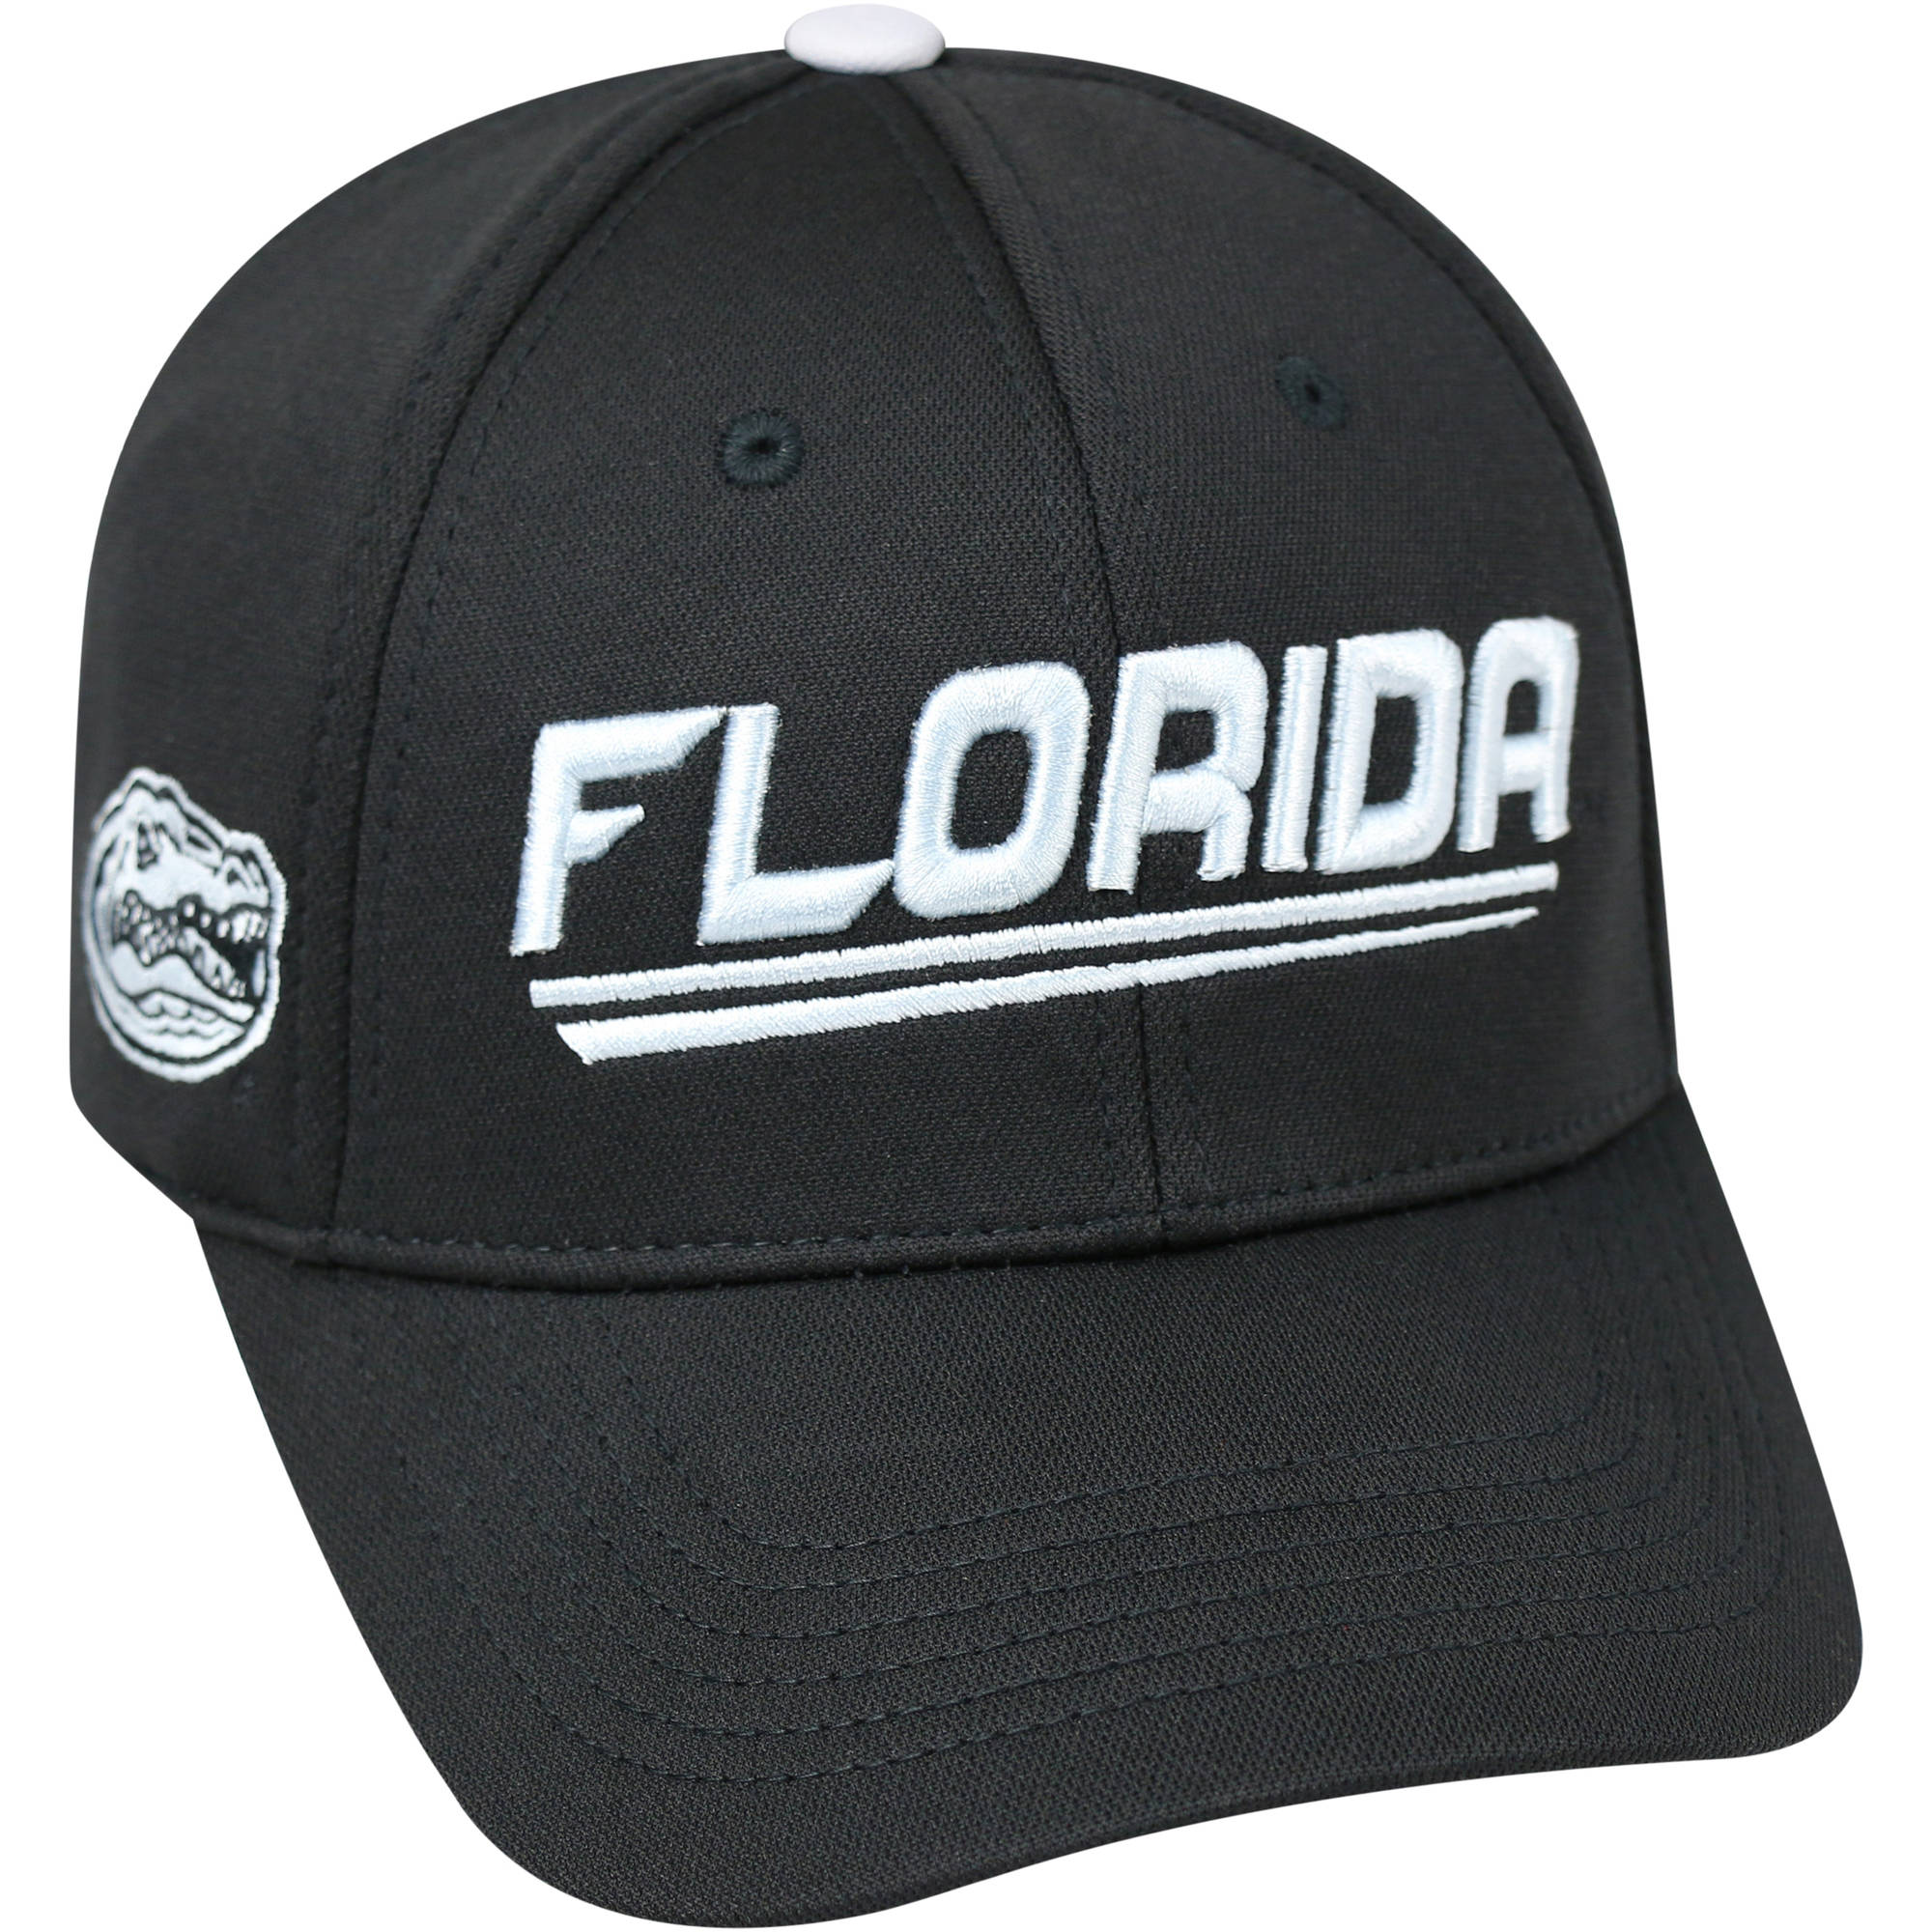 University Of Florida Gators Black Baseball Cap